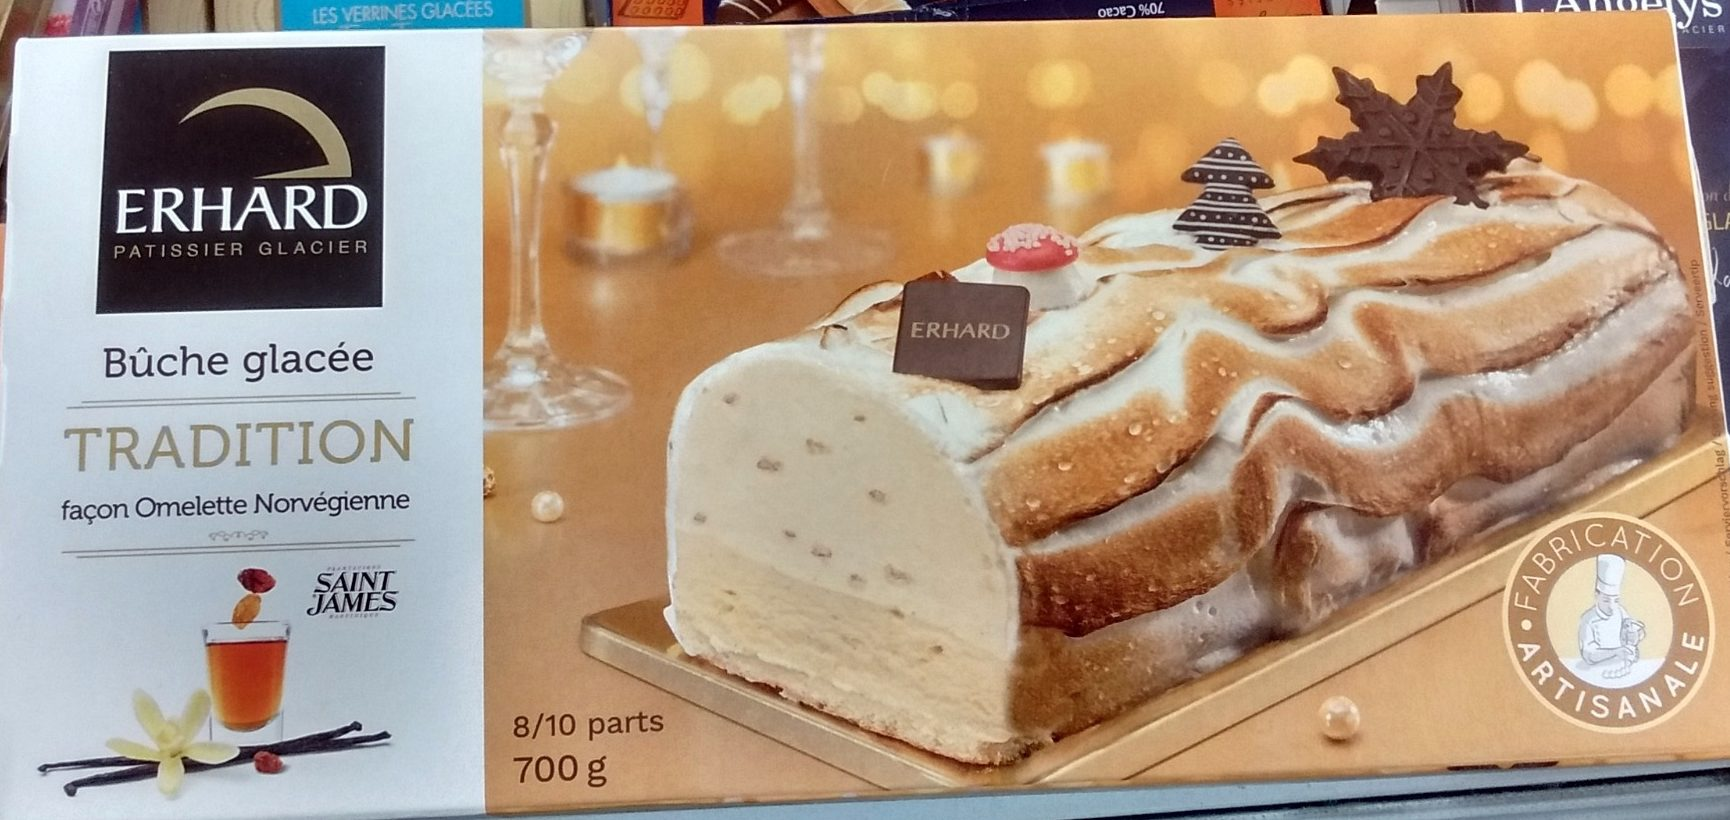 Bûche Glacée Tradition façon Omelette Norvégienne - Product - fr